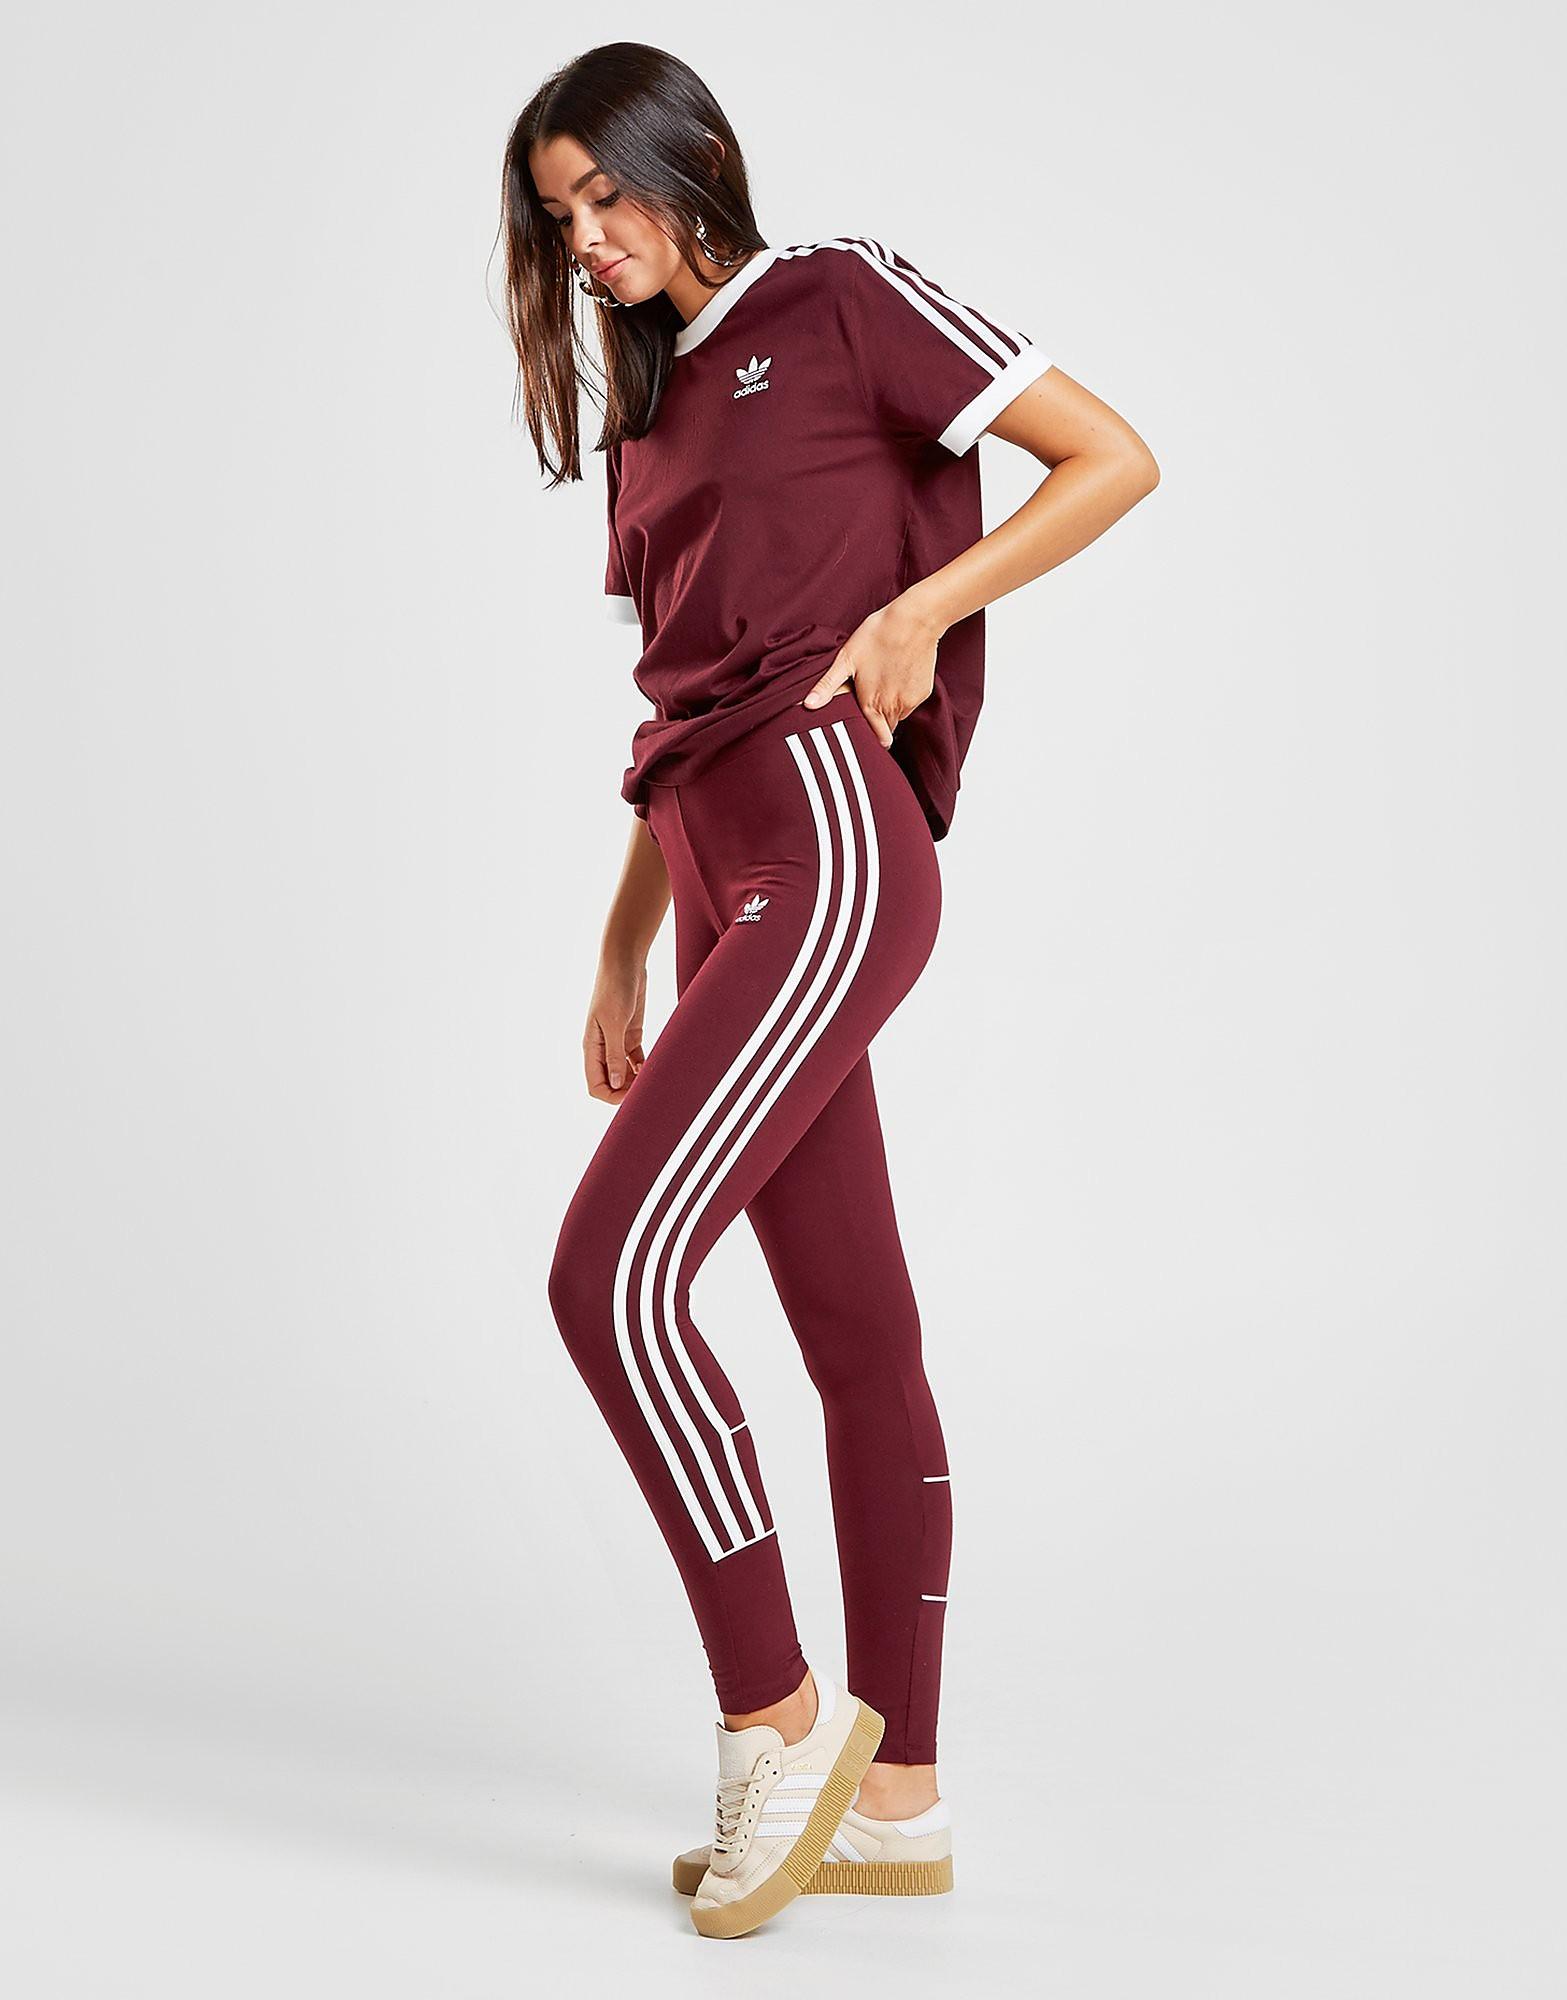 adidas Originals 3-Stripes Piping Leggings Dames - alleen bij JD - Maroon/White - Dames